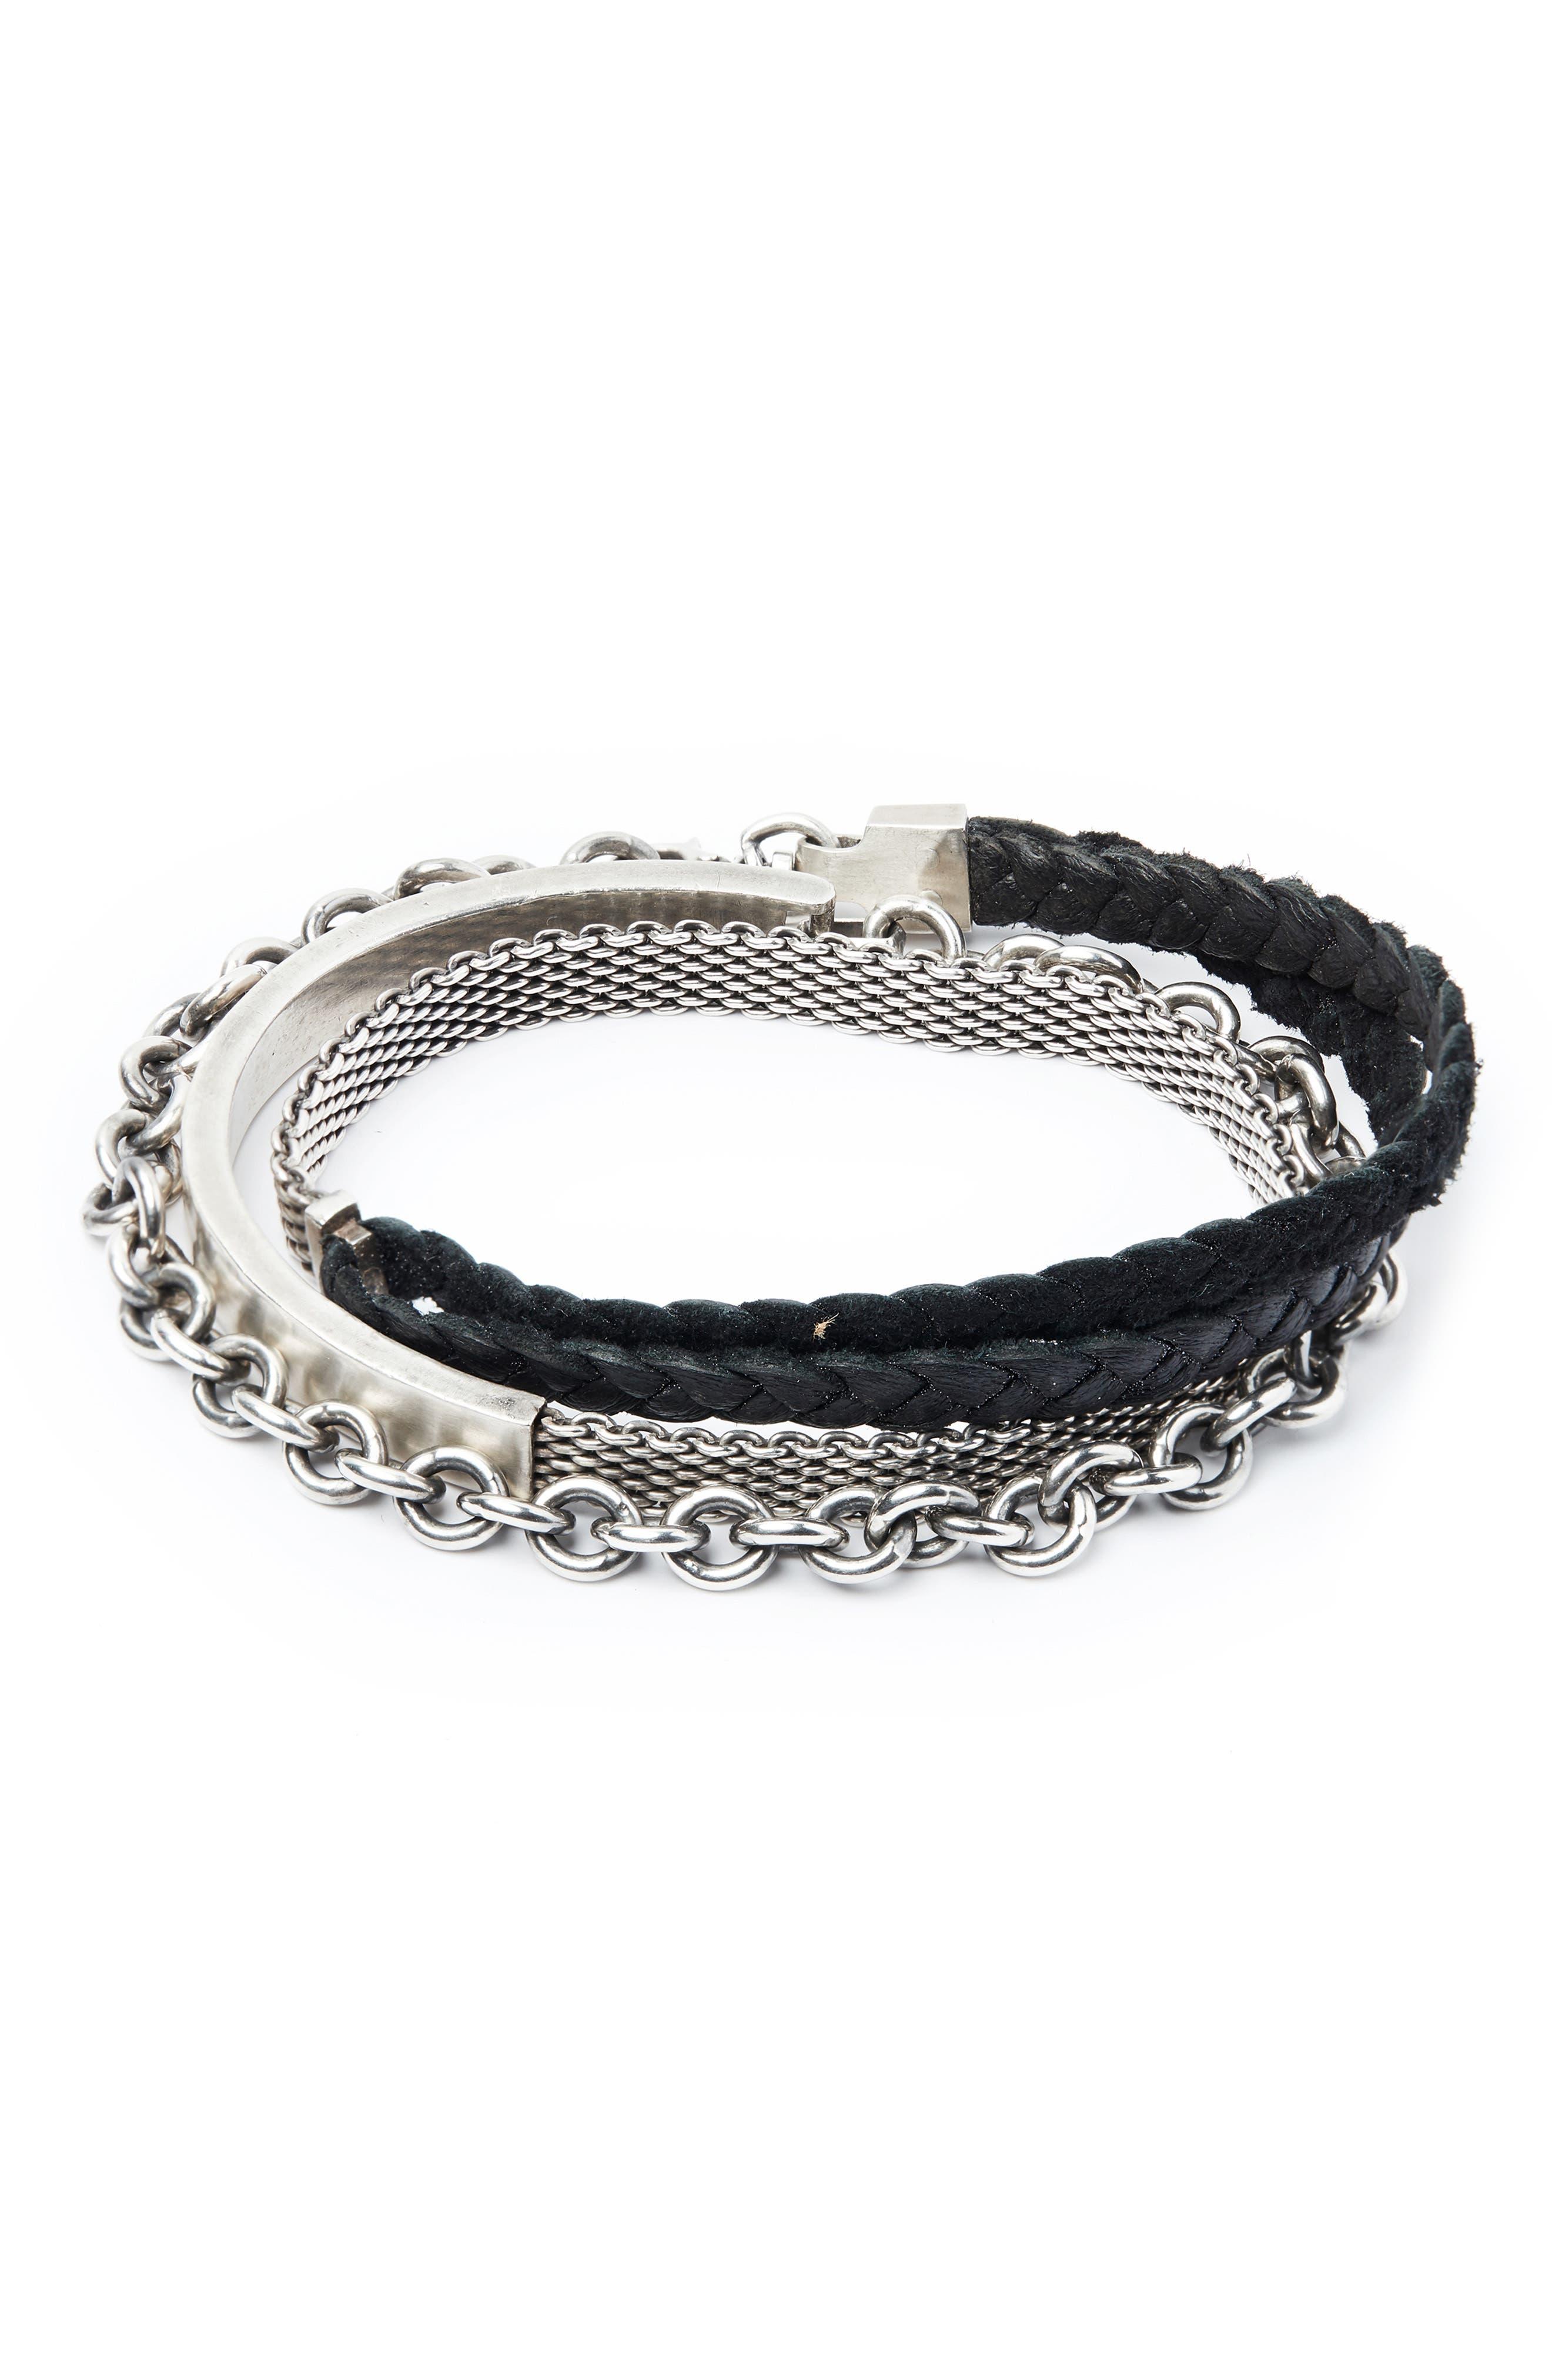 Signature Sterling Silver & Leather Wrap Bracelet,                         Main,                         color, SILVER/ BLACK